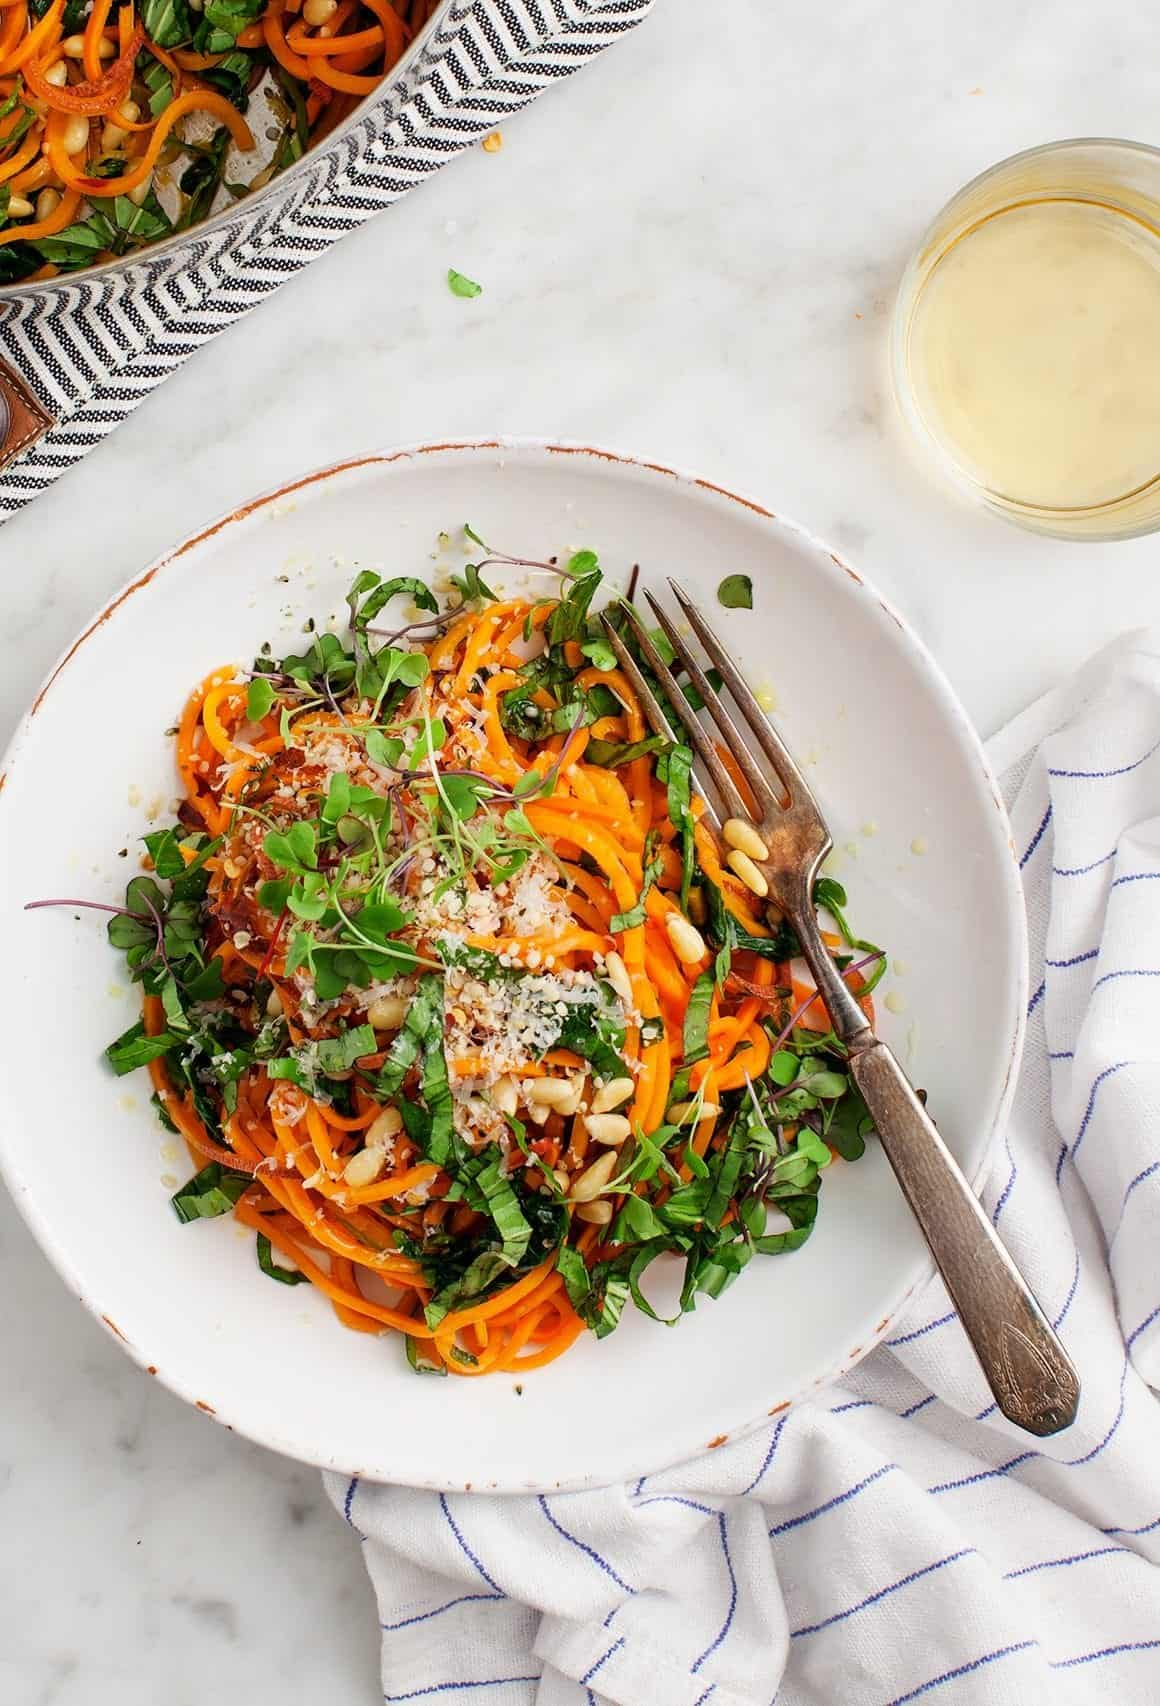 Sweet Potato Noodles with Garlic & Kale